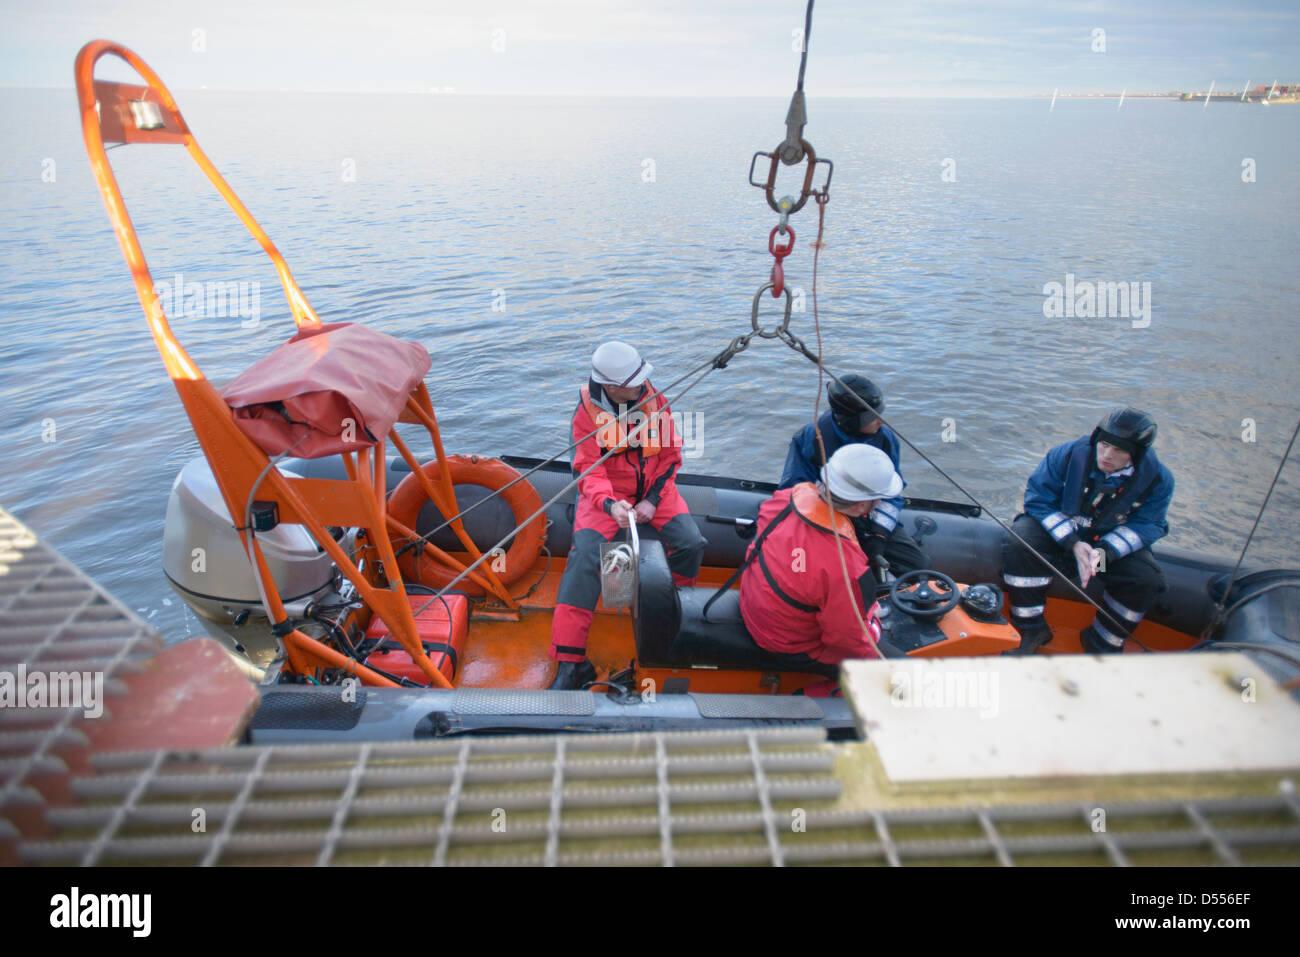 Rettungs-Boots-Training mit dem Schiff Stockbild